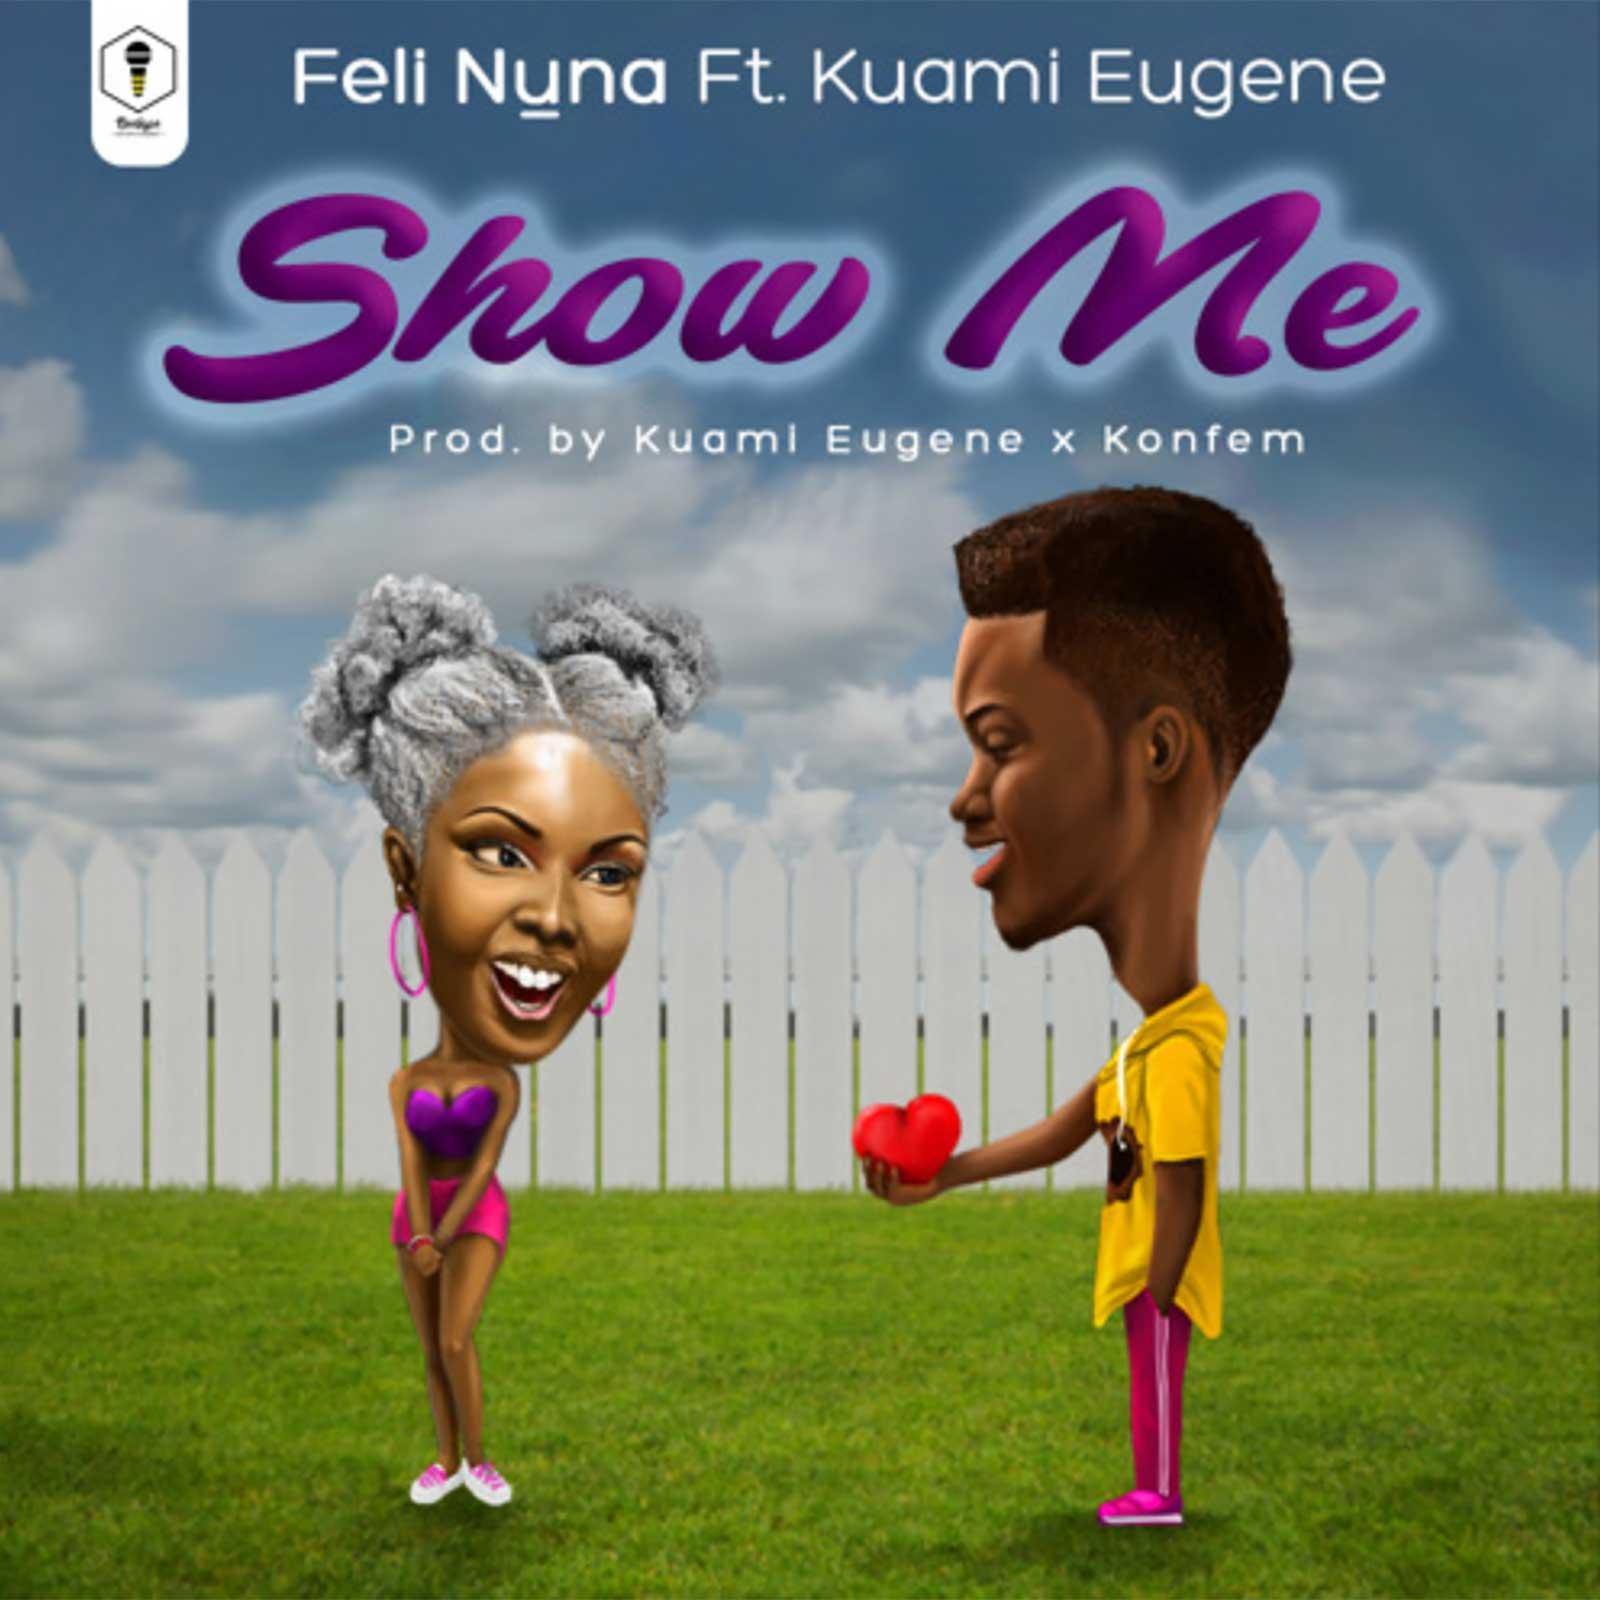 Show Me by Feli Nuna feat. Kuami Eugene